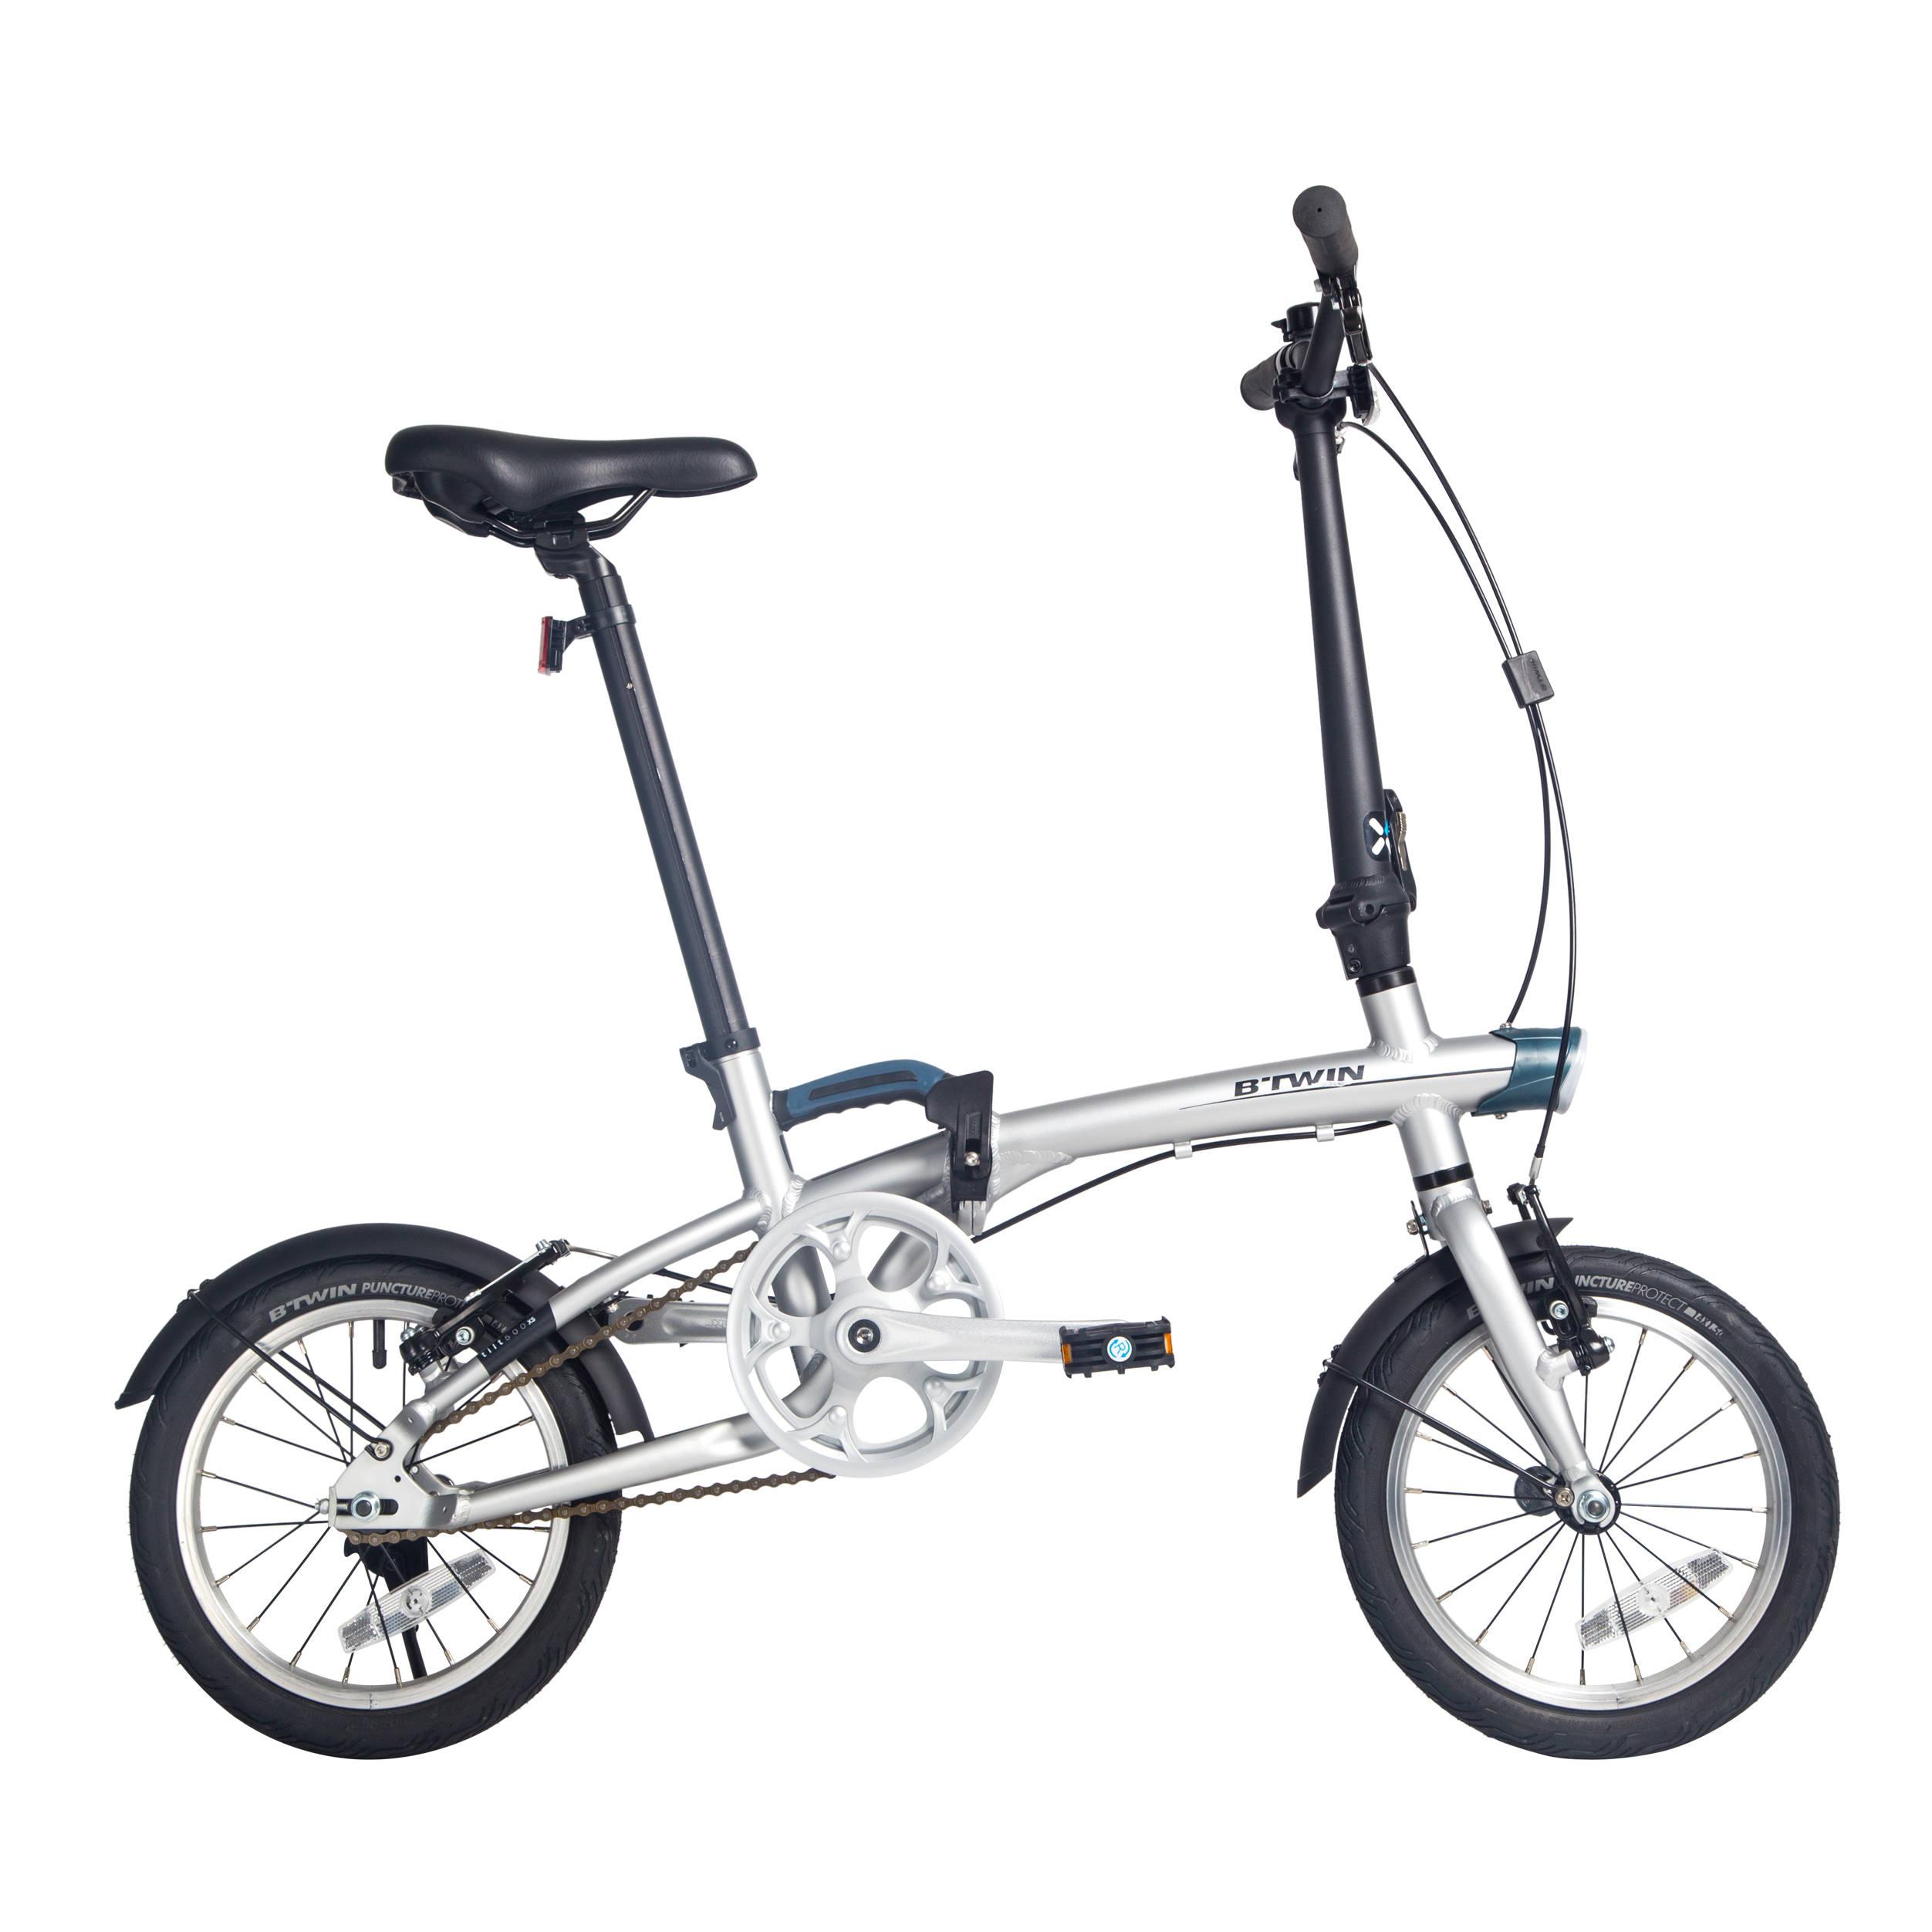 2504x2504 Compact, Folding Bikes Tilt 500 Folding Bike Xs Cn